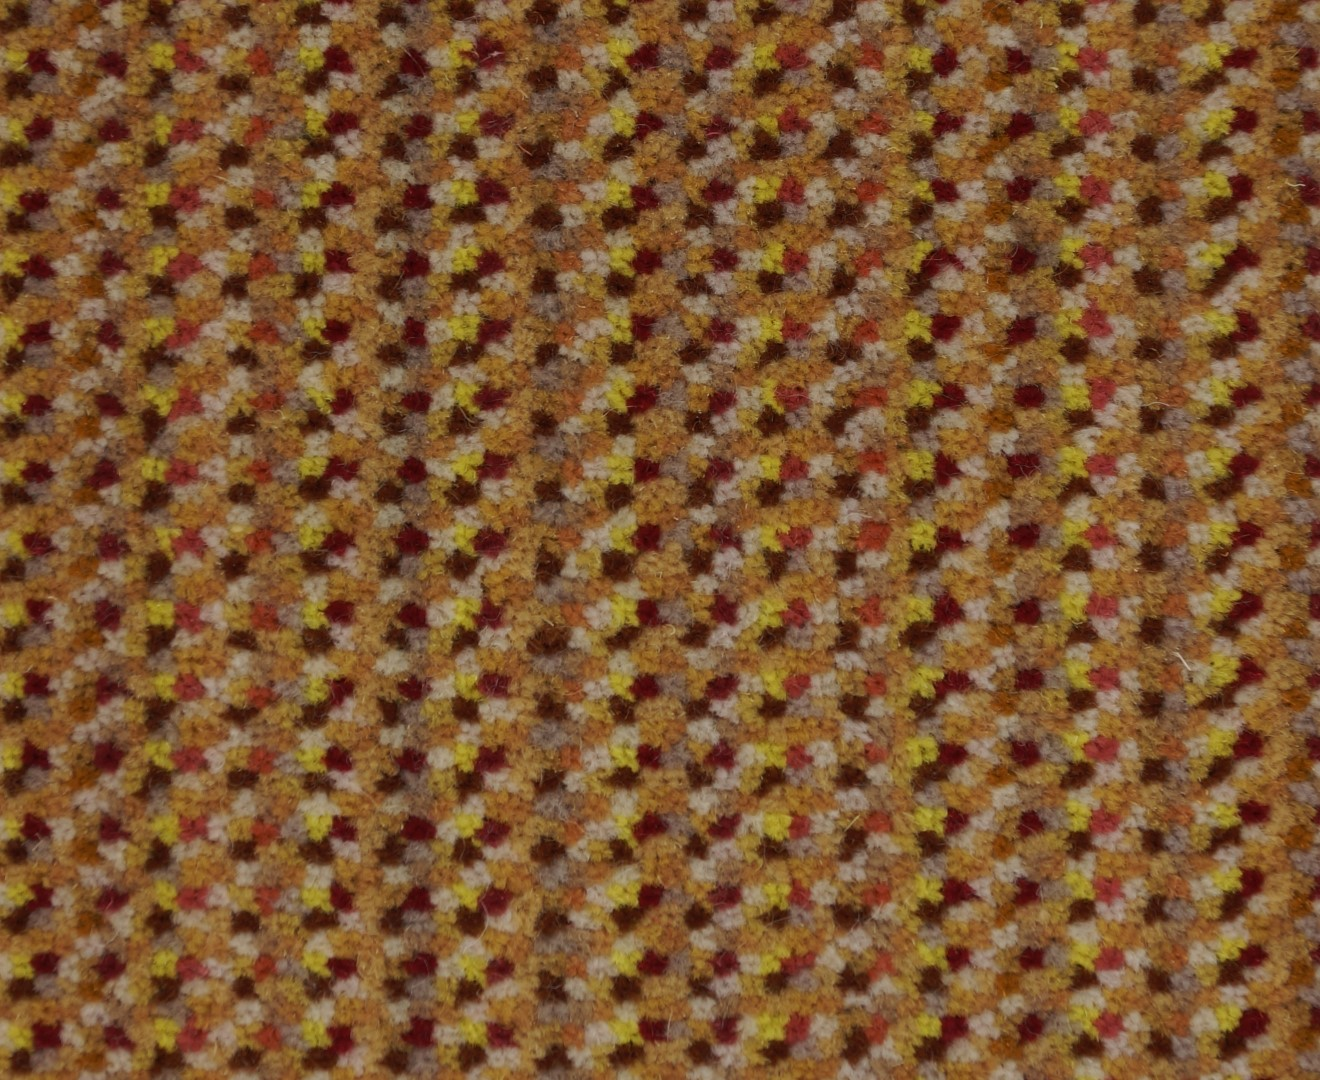 Moquette tiss e 100 laine unie structur e ray e milpoints coup terracota collection for Moquette rayee